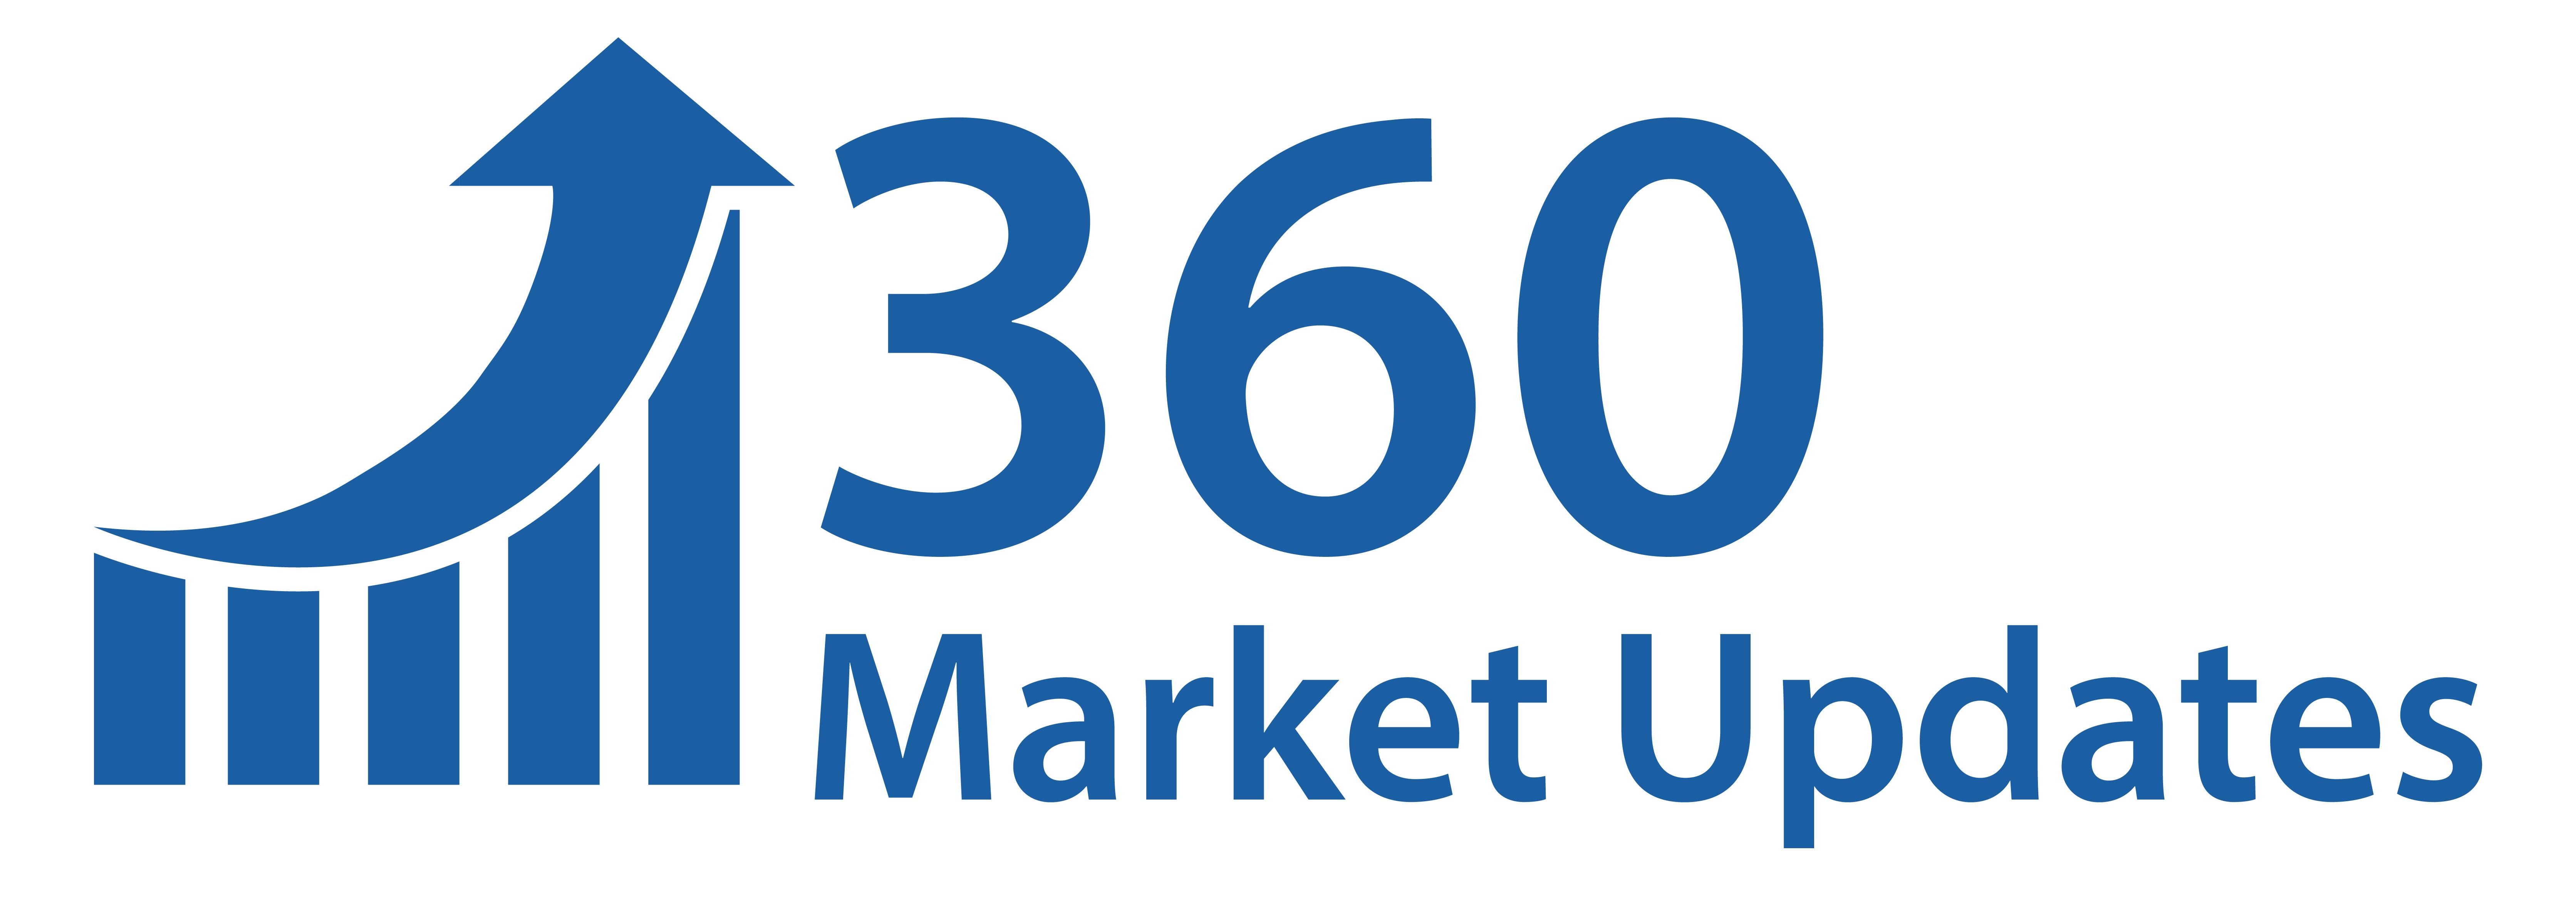 Frische Fleischverpackungen Marktproduktion, Top Top Key Players-Berry Plastic Group, Inc., Multivac Sepp Haggenmüller GmbH & Co.KG, Import, Export and Consumption Forecast & Regional Analysis bis 2023